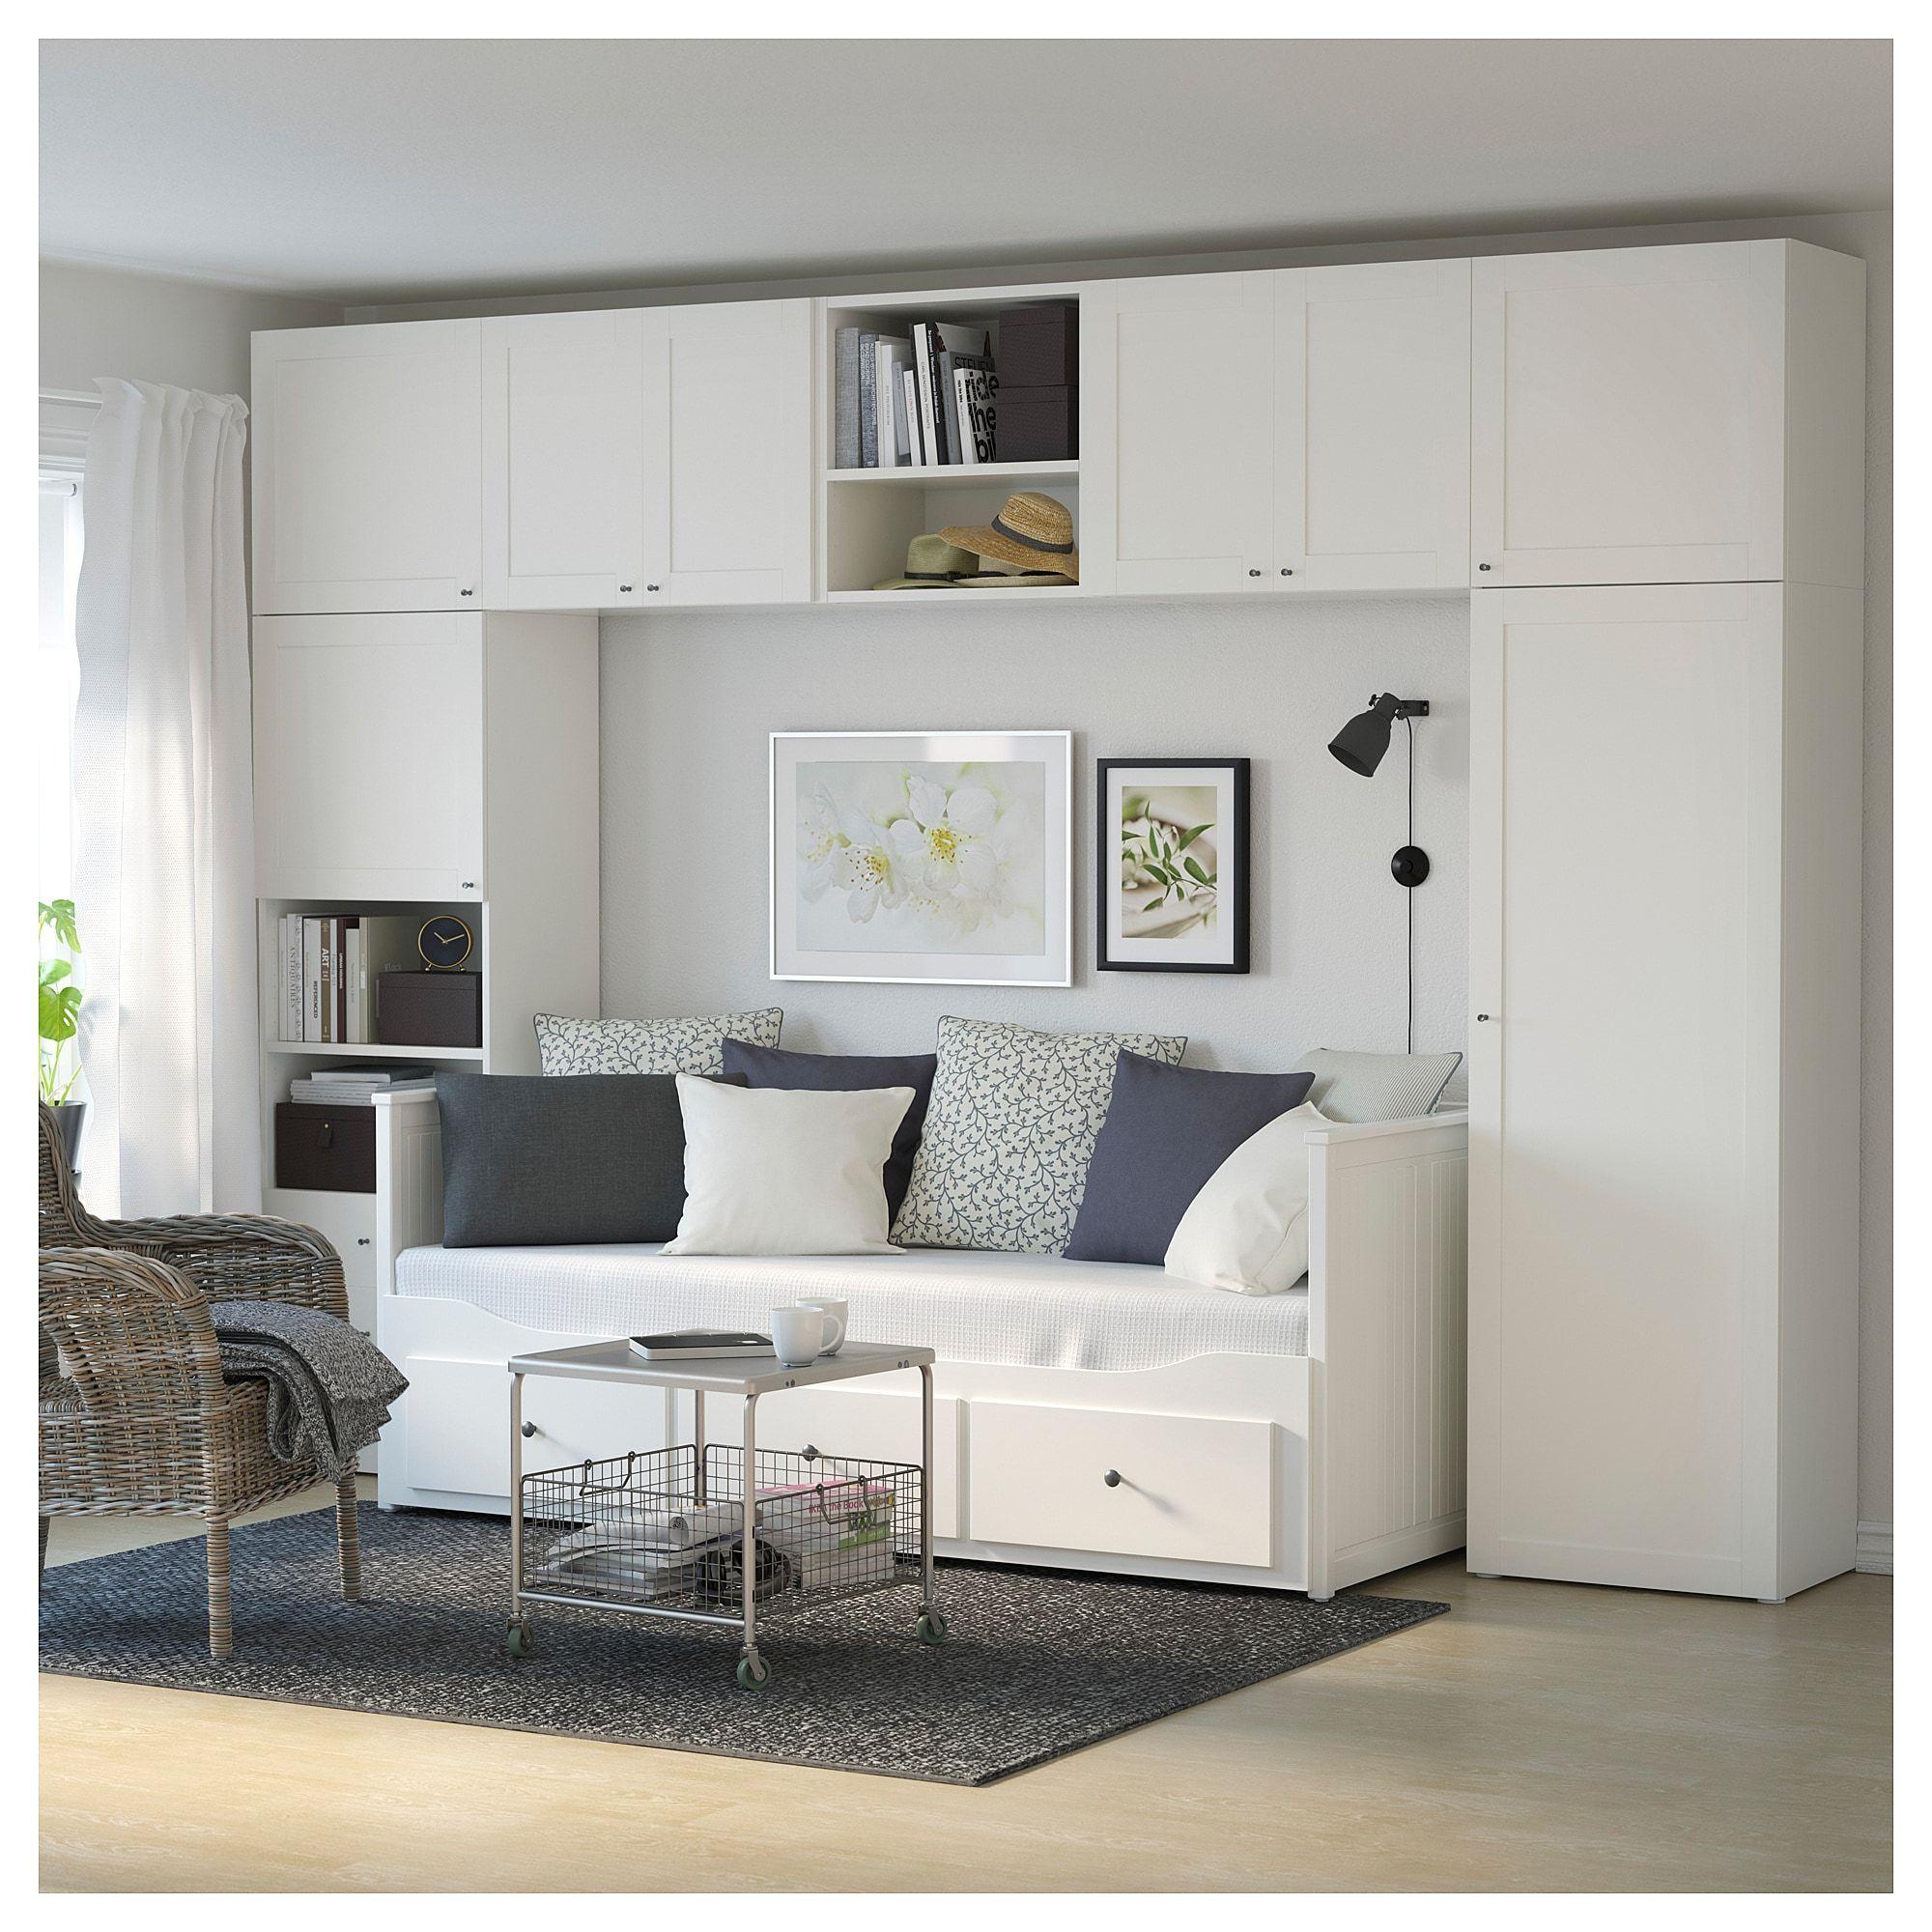 Platsa Kleiderschrank Weiss Fonnes Sannidal Platsa Wardrobe White Fonnes Sannidal In 2020 Bedroom Furniture Layout Small Bedroom Furniture Ikea Living Room